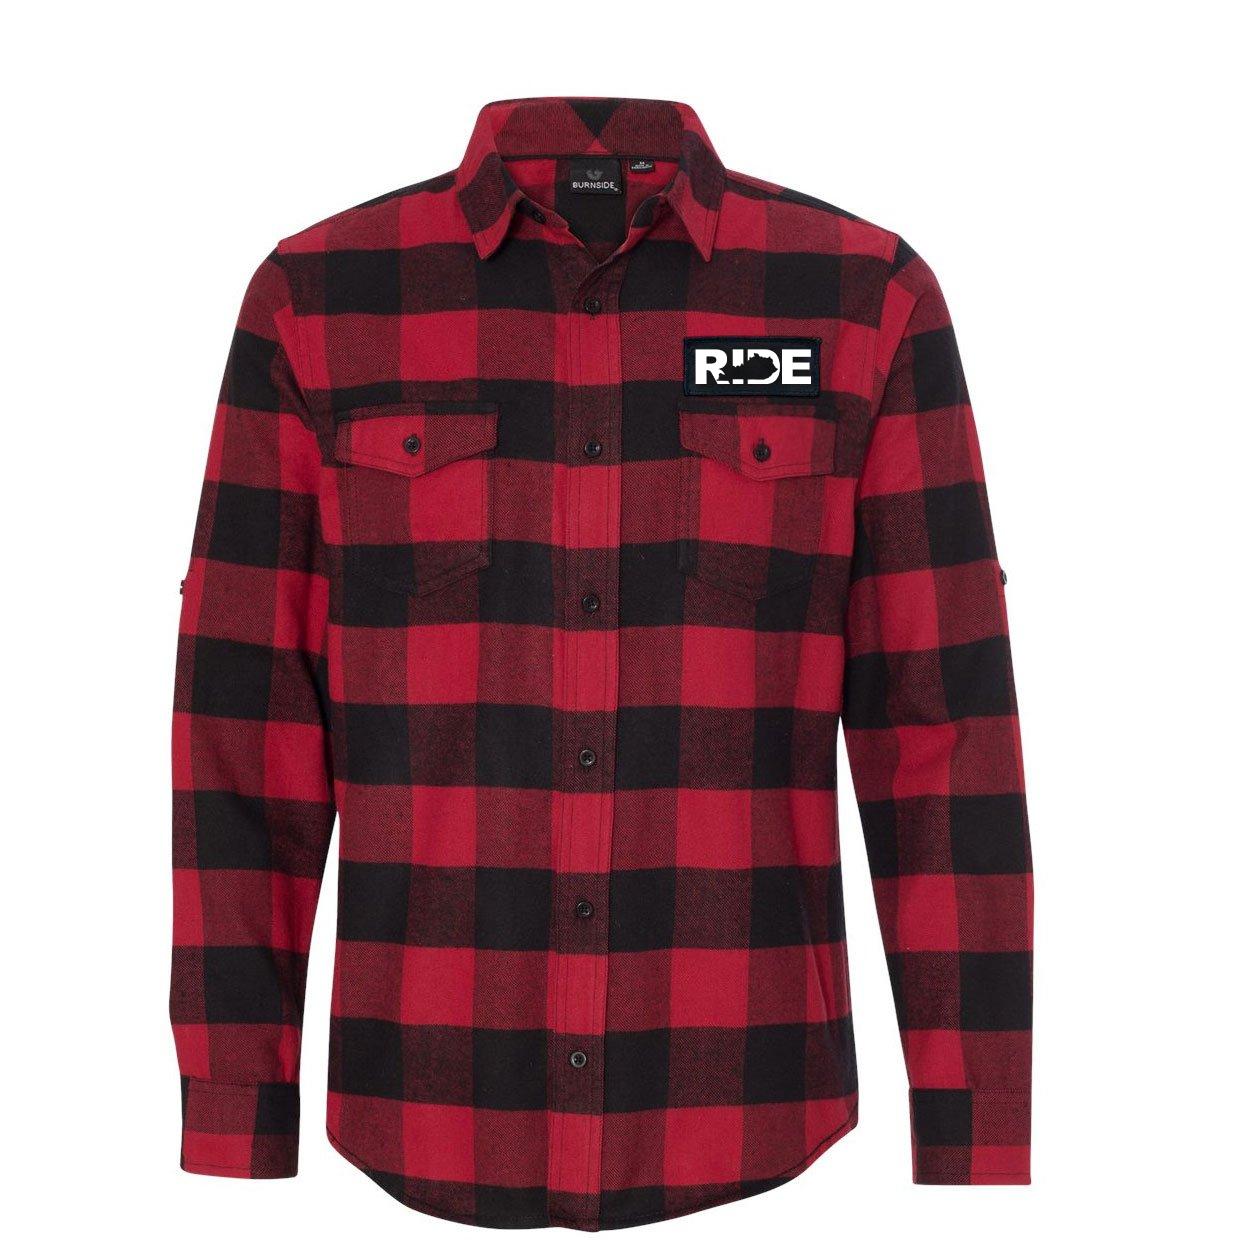 Ride Kentucky Classic Unisex Long Sleeve Woven Patch Flannel Shirt Red/Black Buffalo (White Logo)